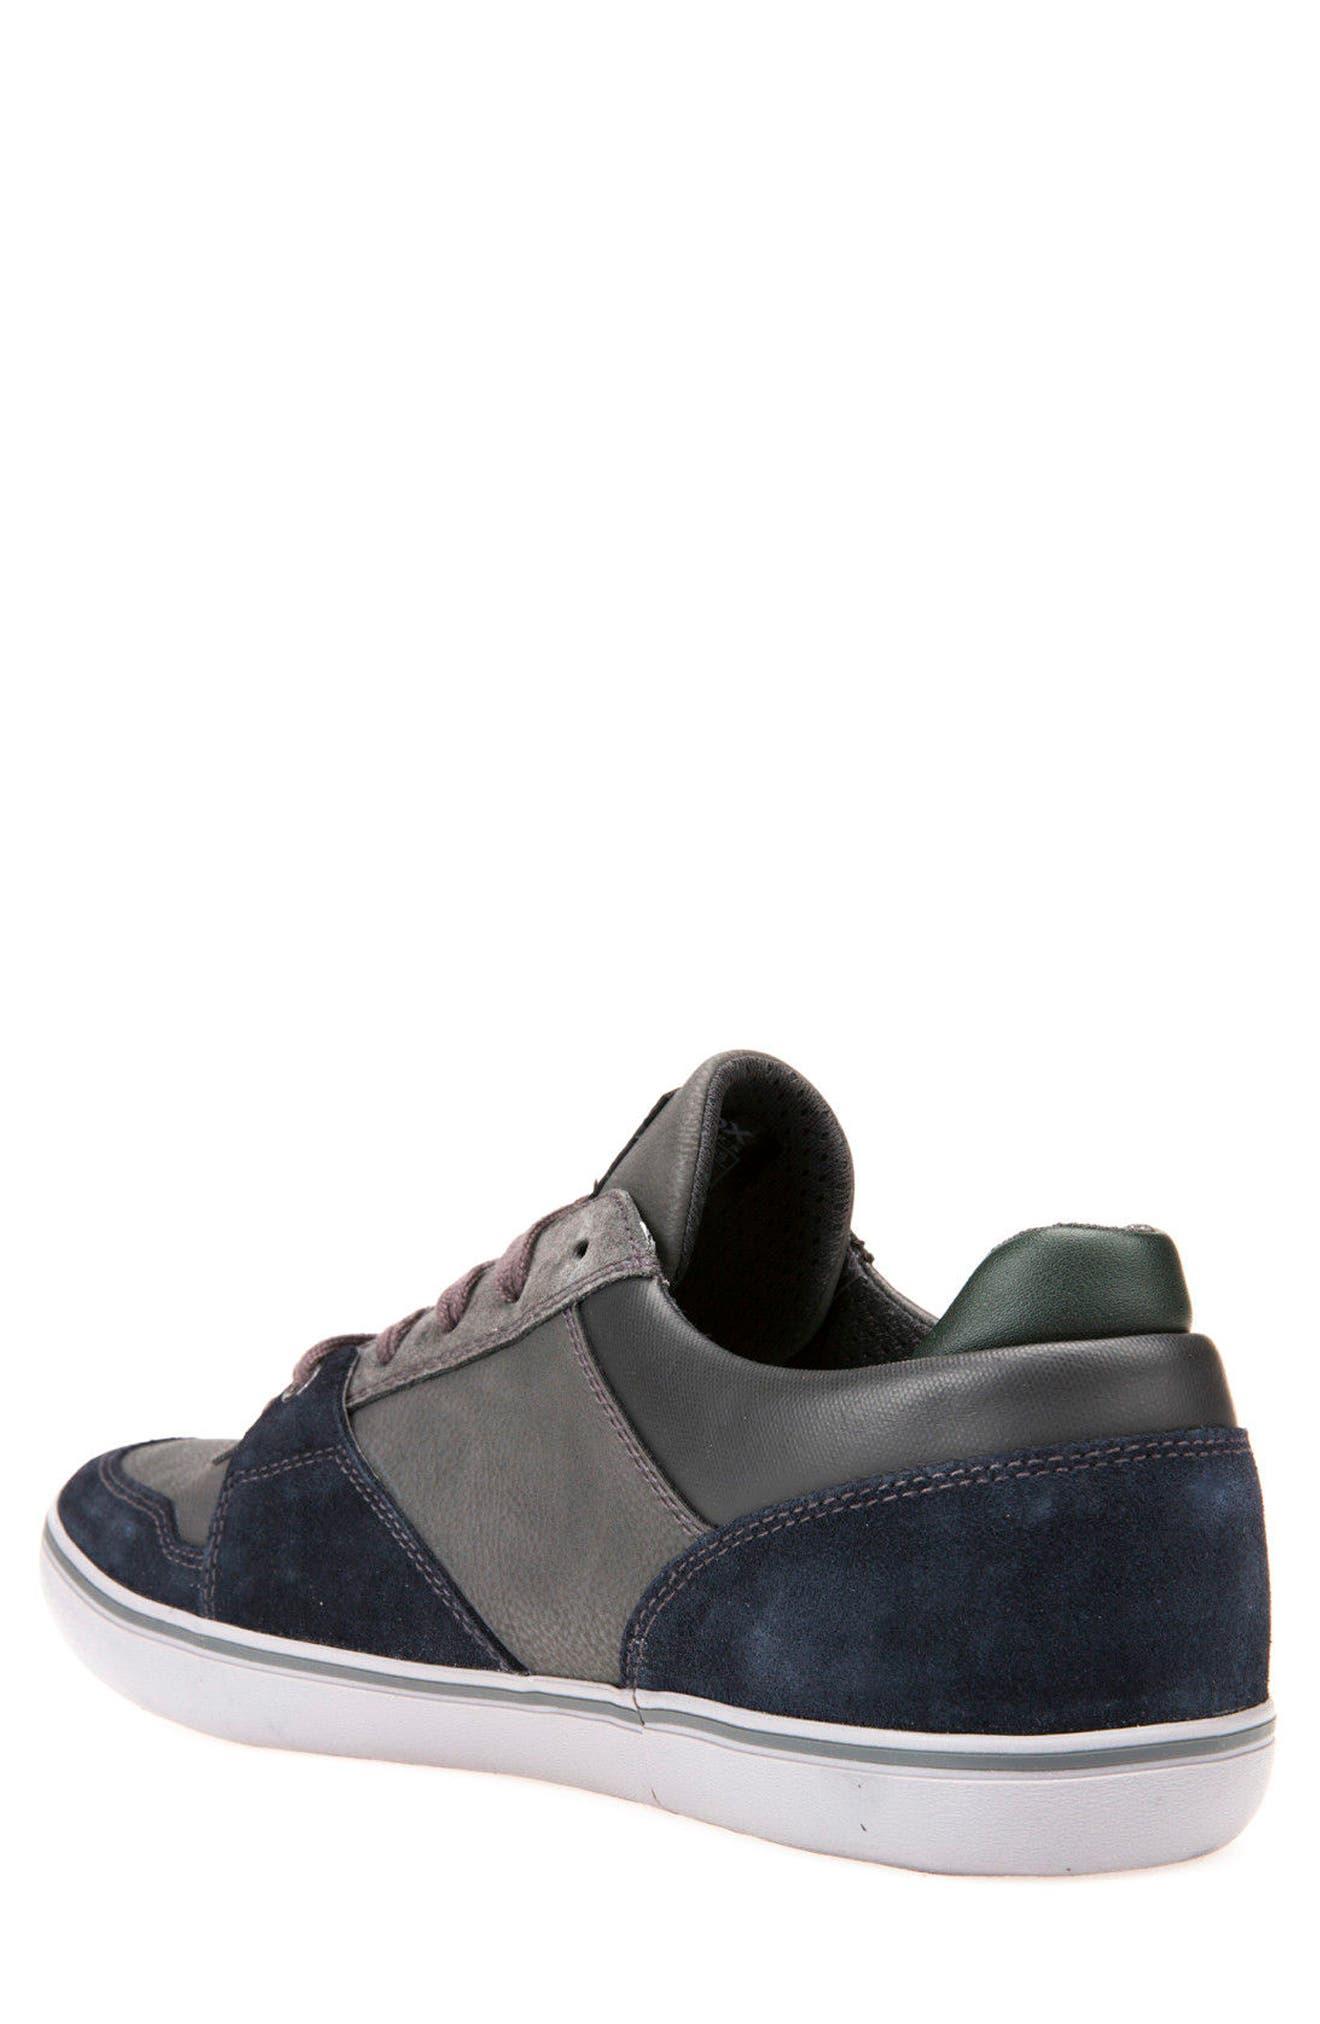 Box 26 Low Top Sneaker,                             Alternate thumbnail 2, color,                             461